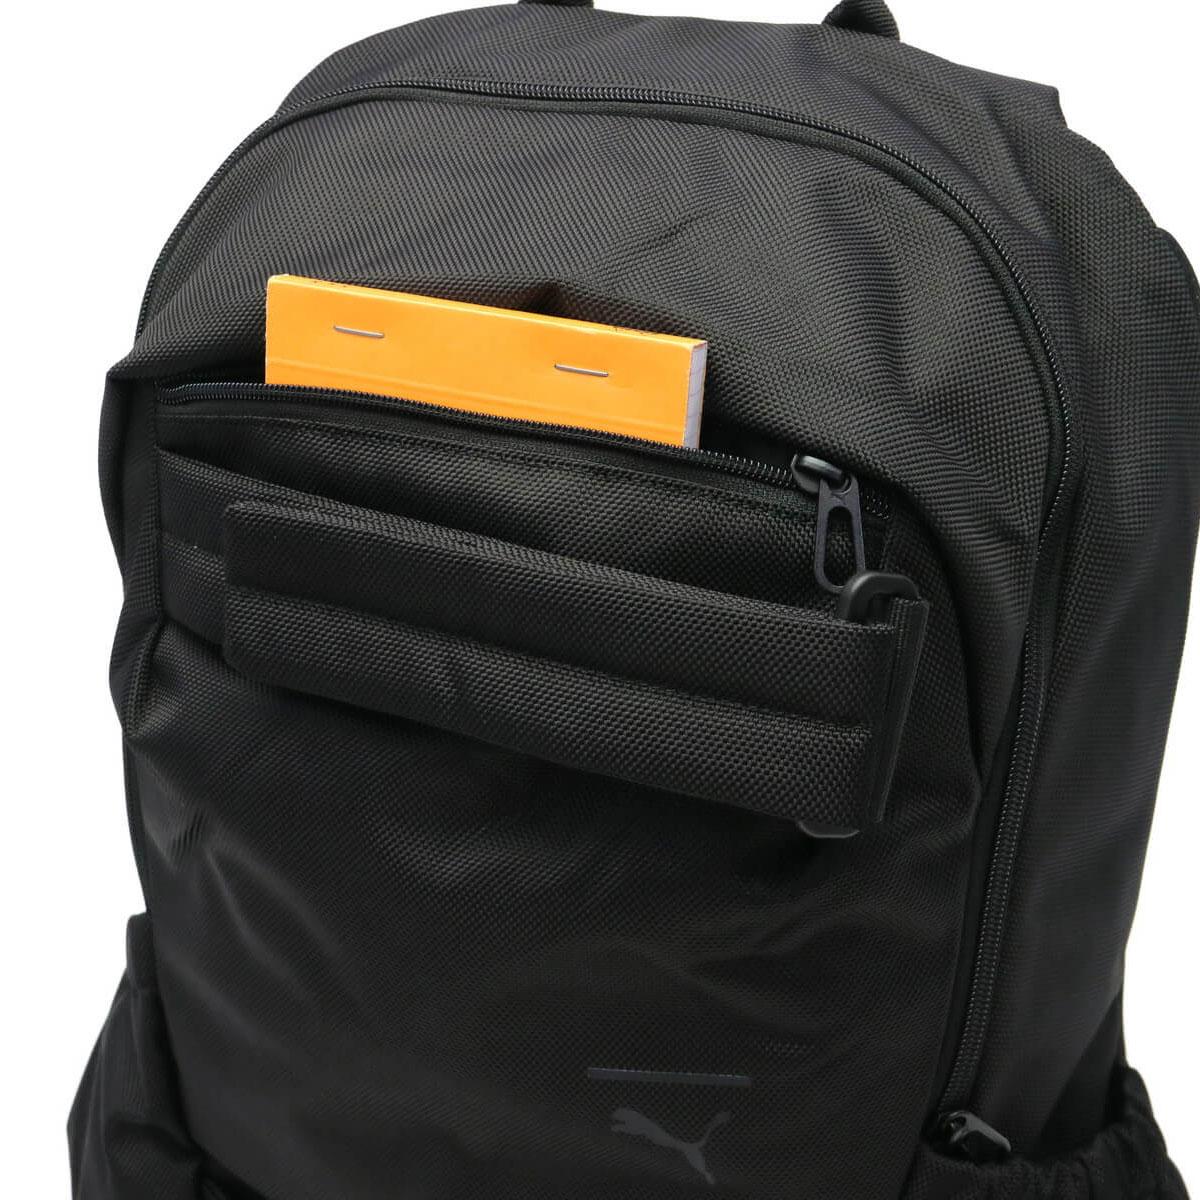 SALE 30% OFF  PUMA backpack rucksack mens womens A4 PCStorage commuting to  school Street Fashion 075450 3184c2a44c4e6